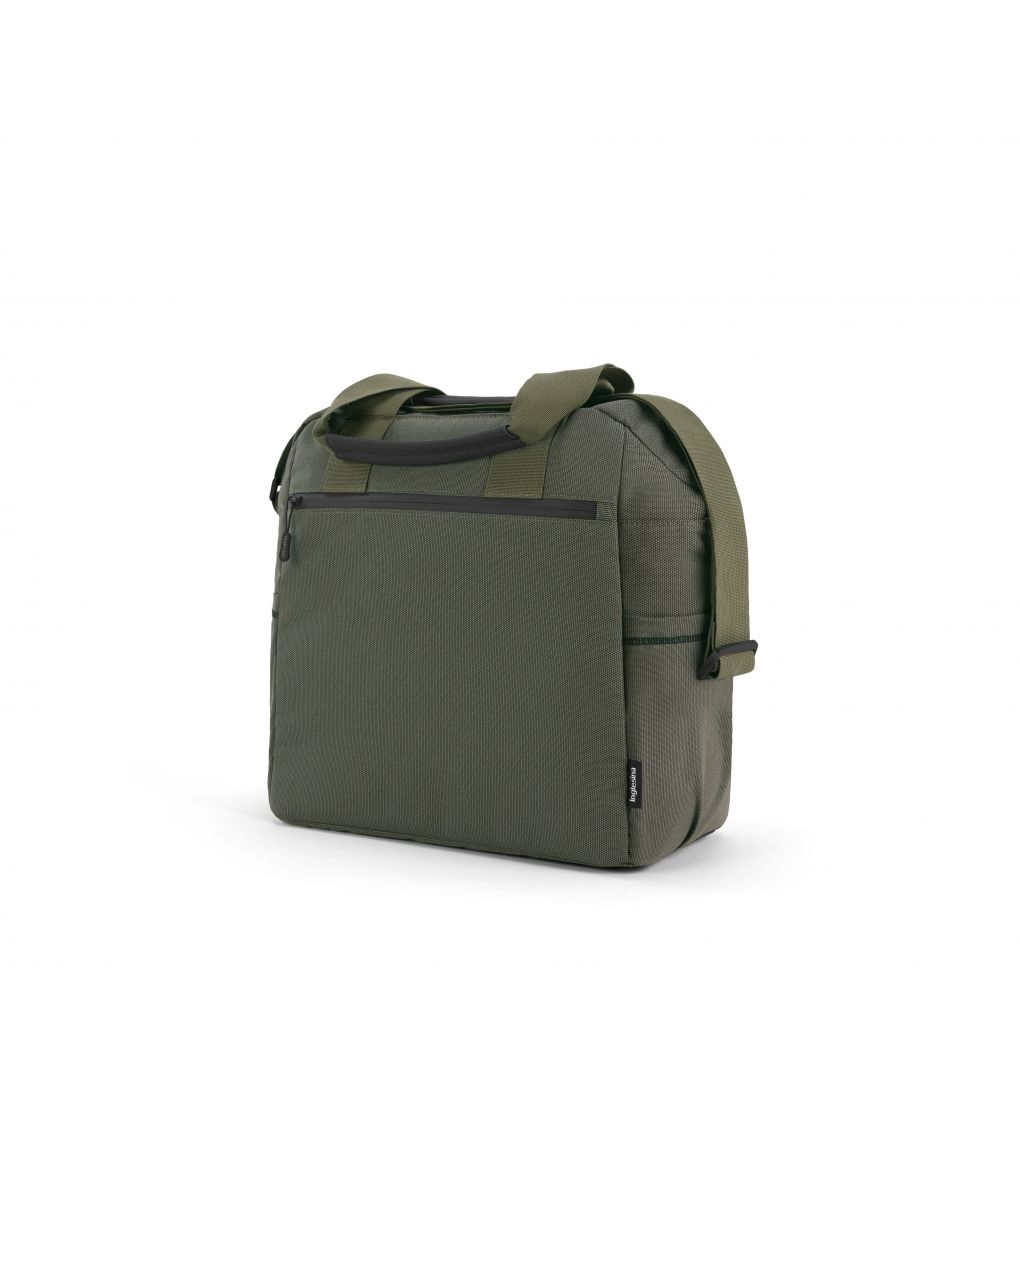 Inglesina Τσάντα Inglesina Aptica XT Day Bag Sequoia Green